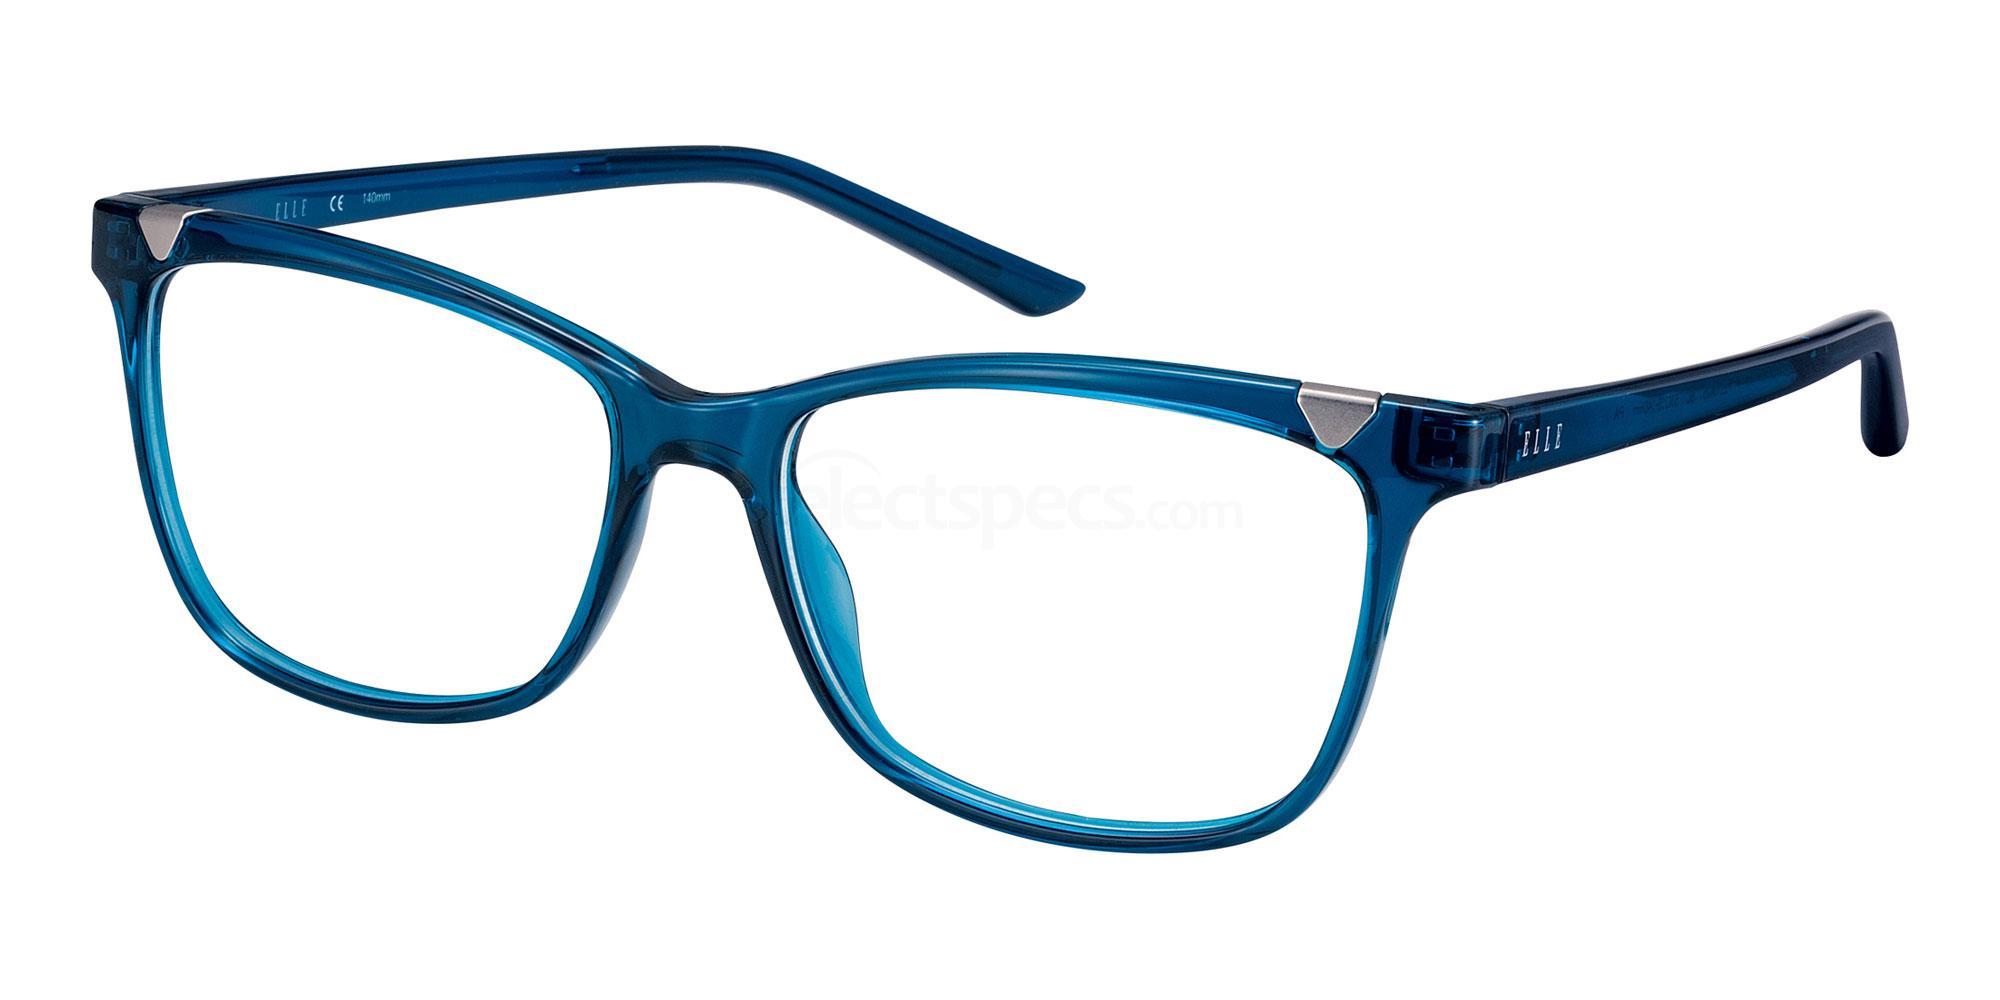 BL EL13425 Glasses, ELLE